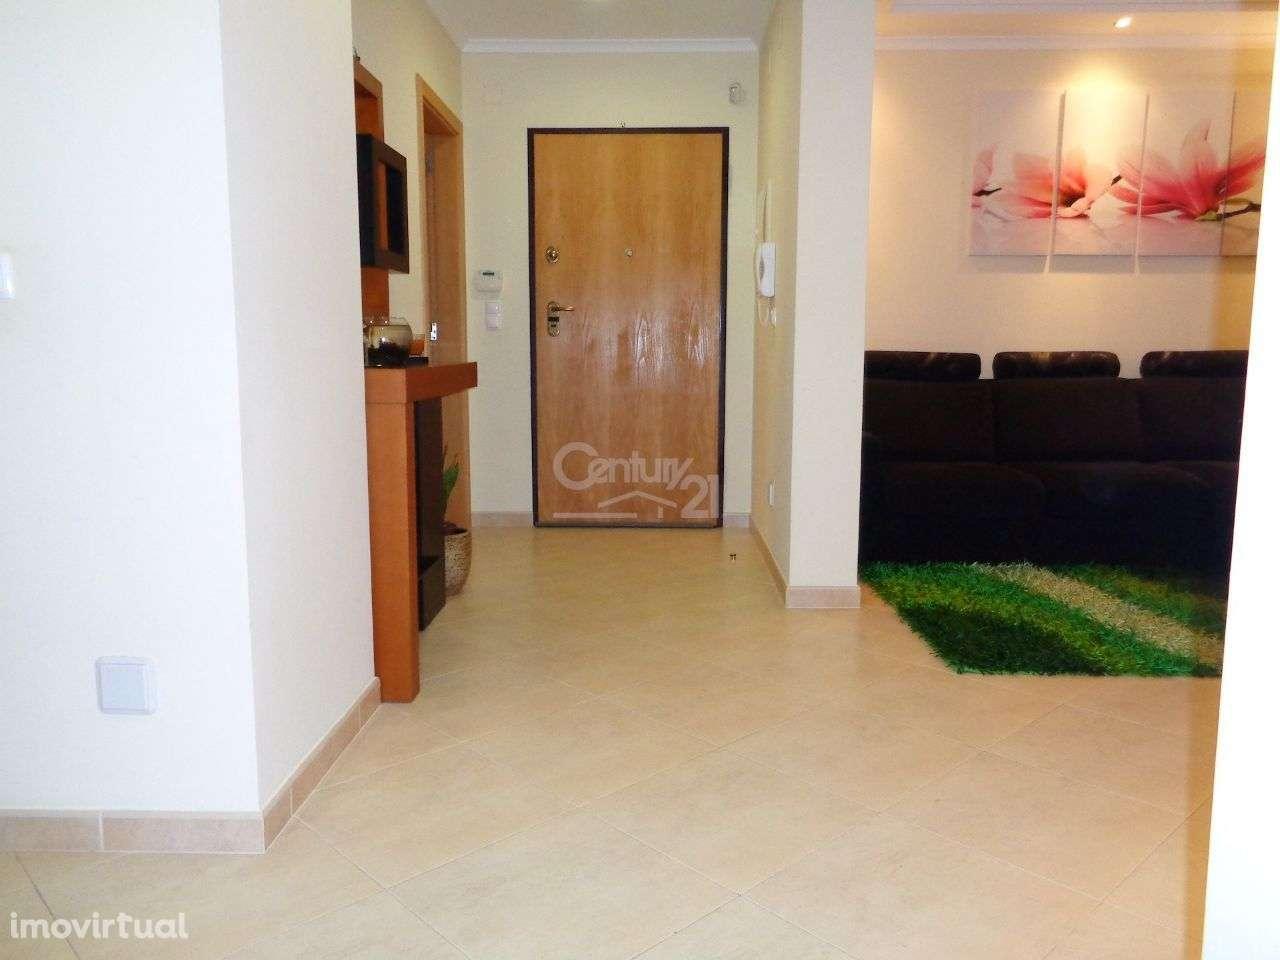 Apartamento para comprar, Quinta do Conde, Setúbal - Foto 12